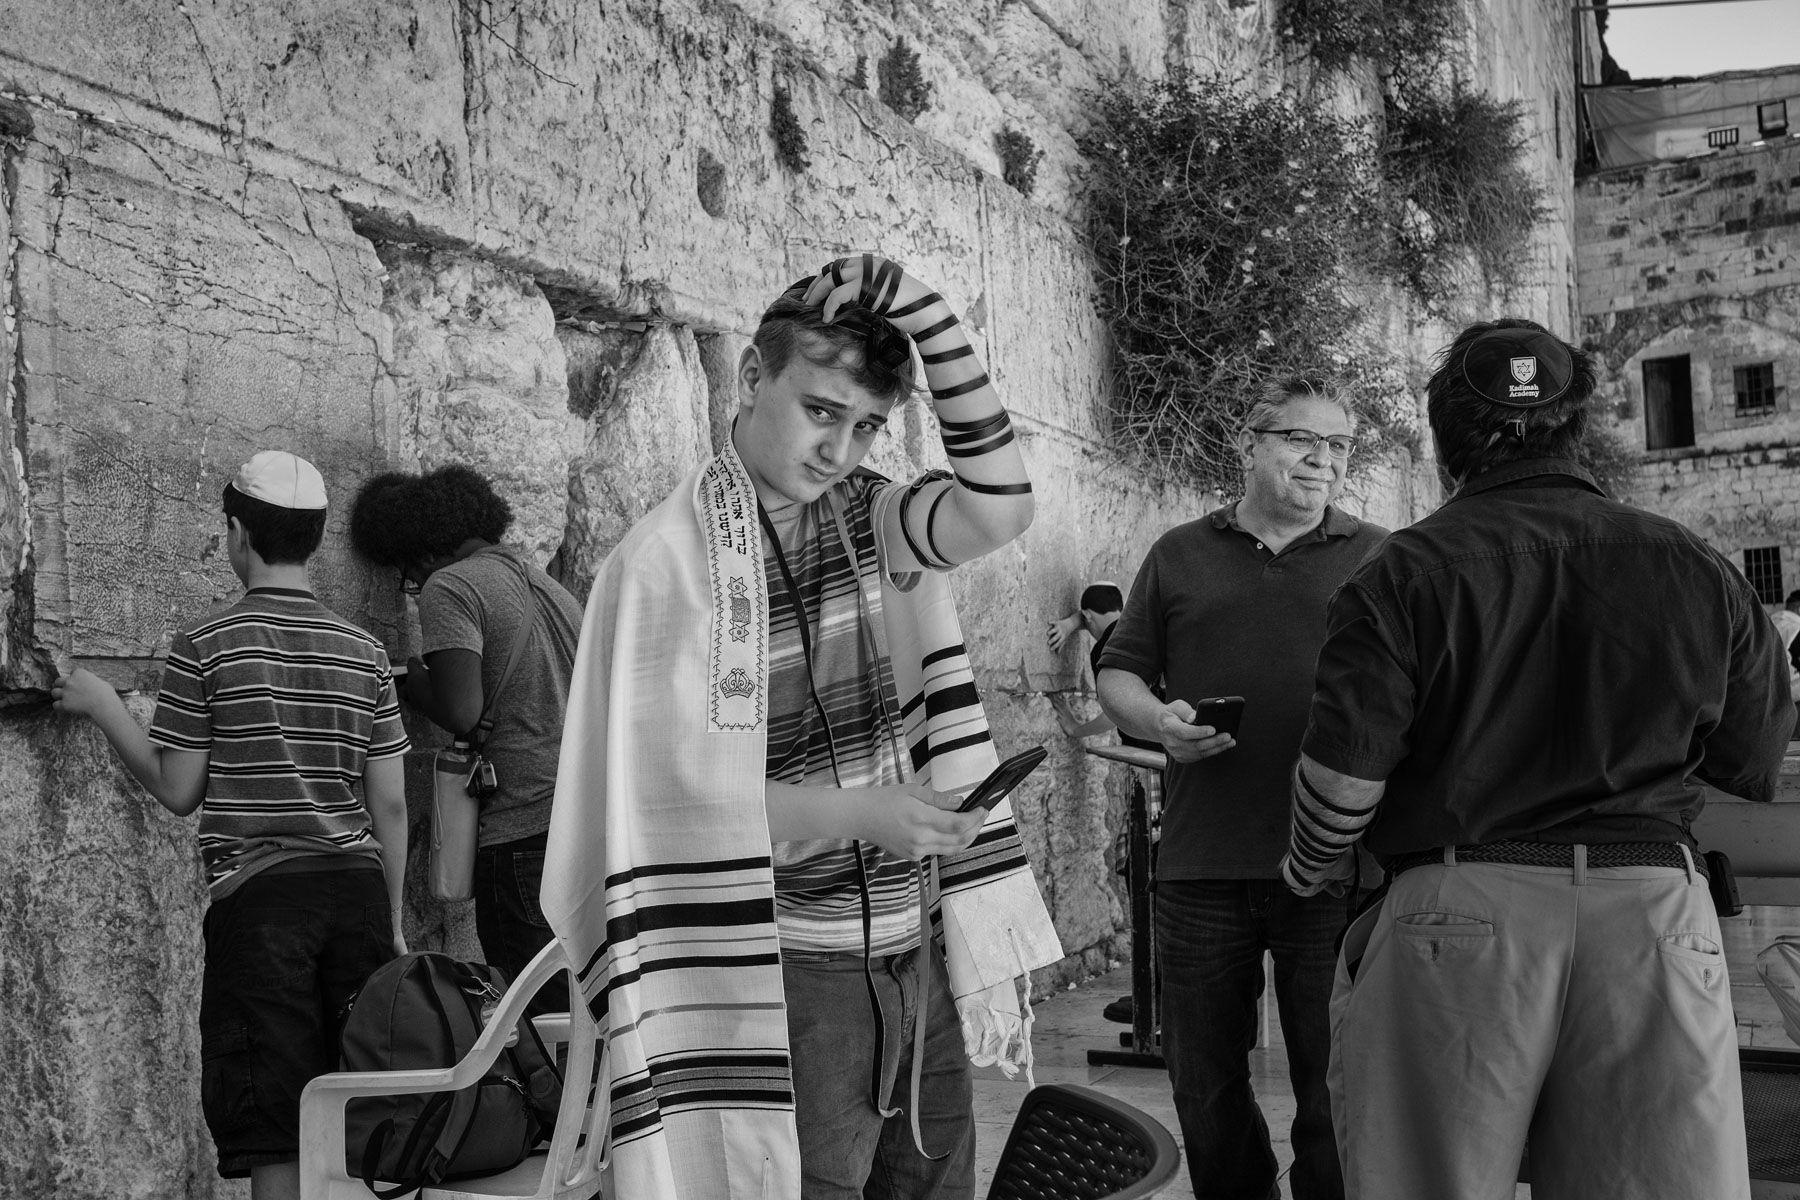 Jerusalem, Israel 05/12/17